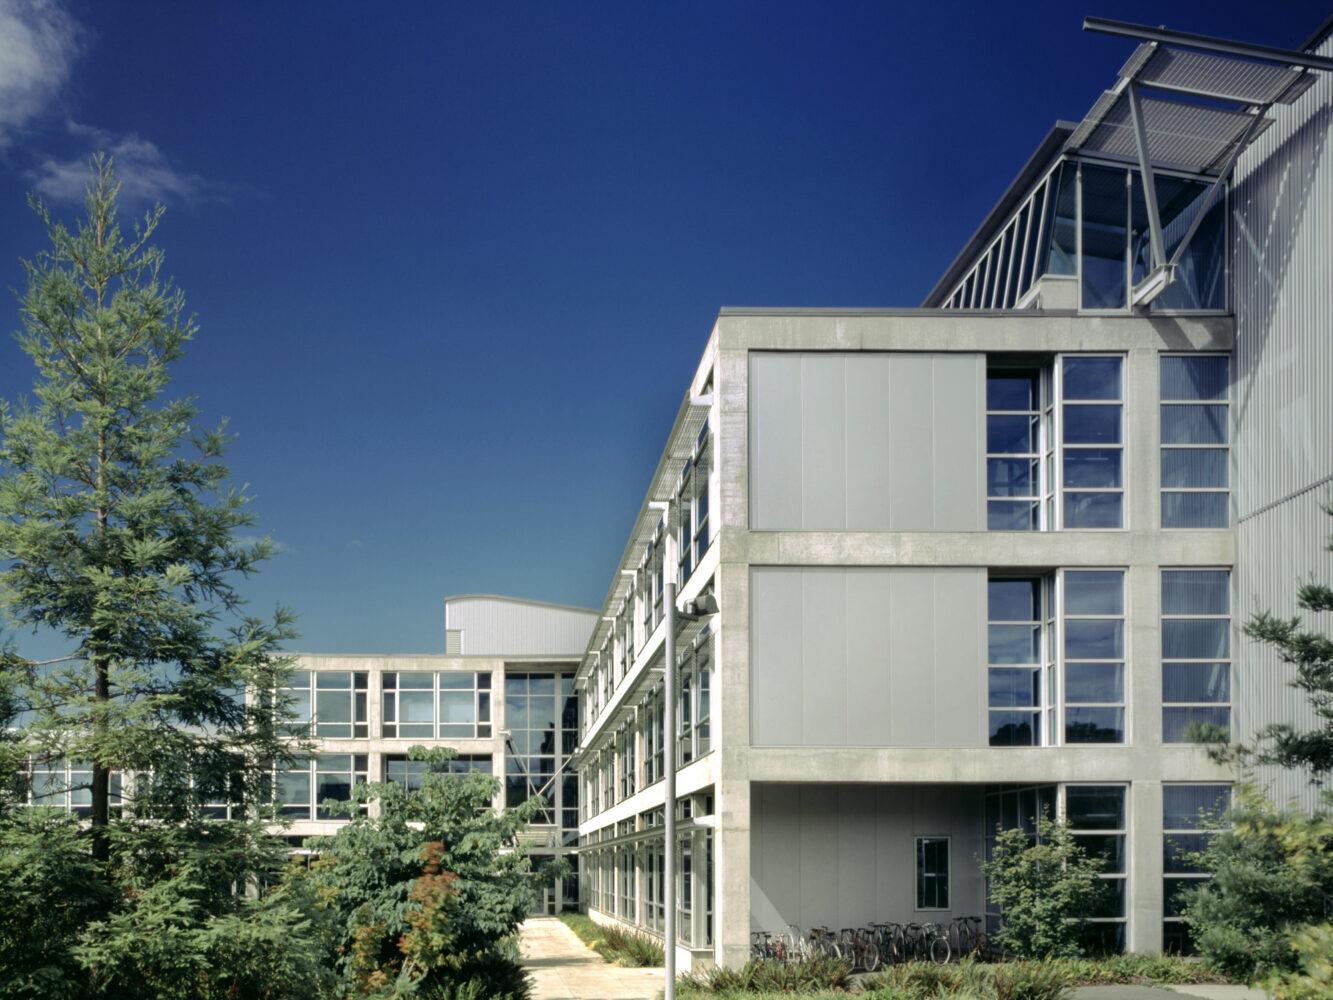 University of Washington School of Fisheries